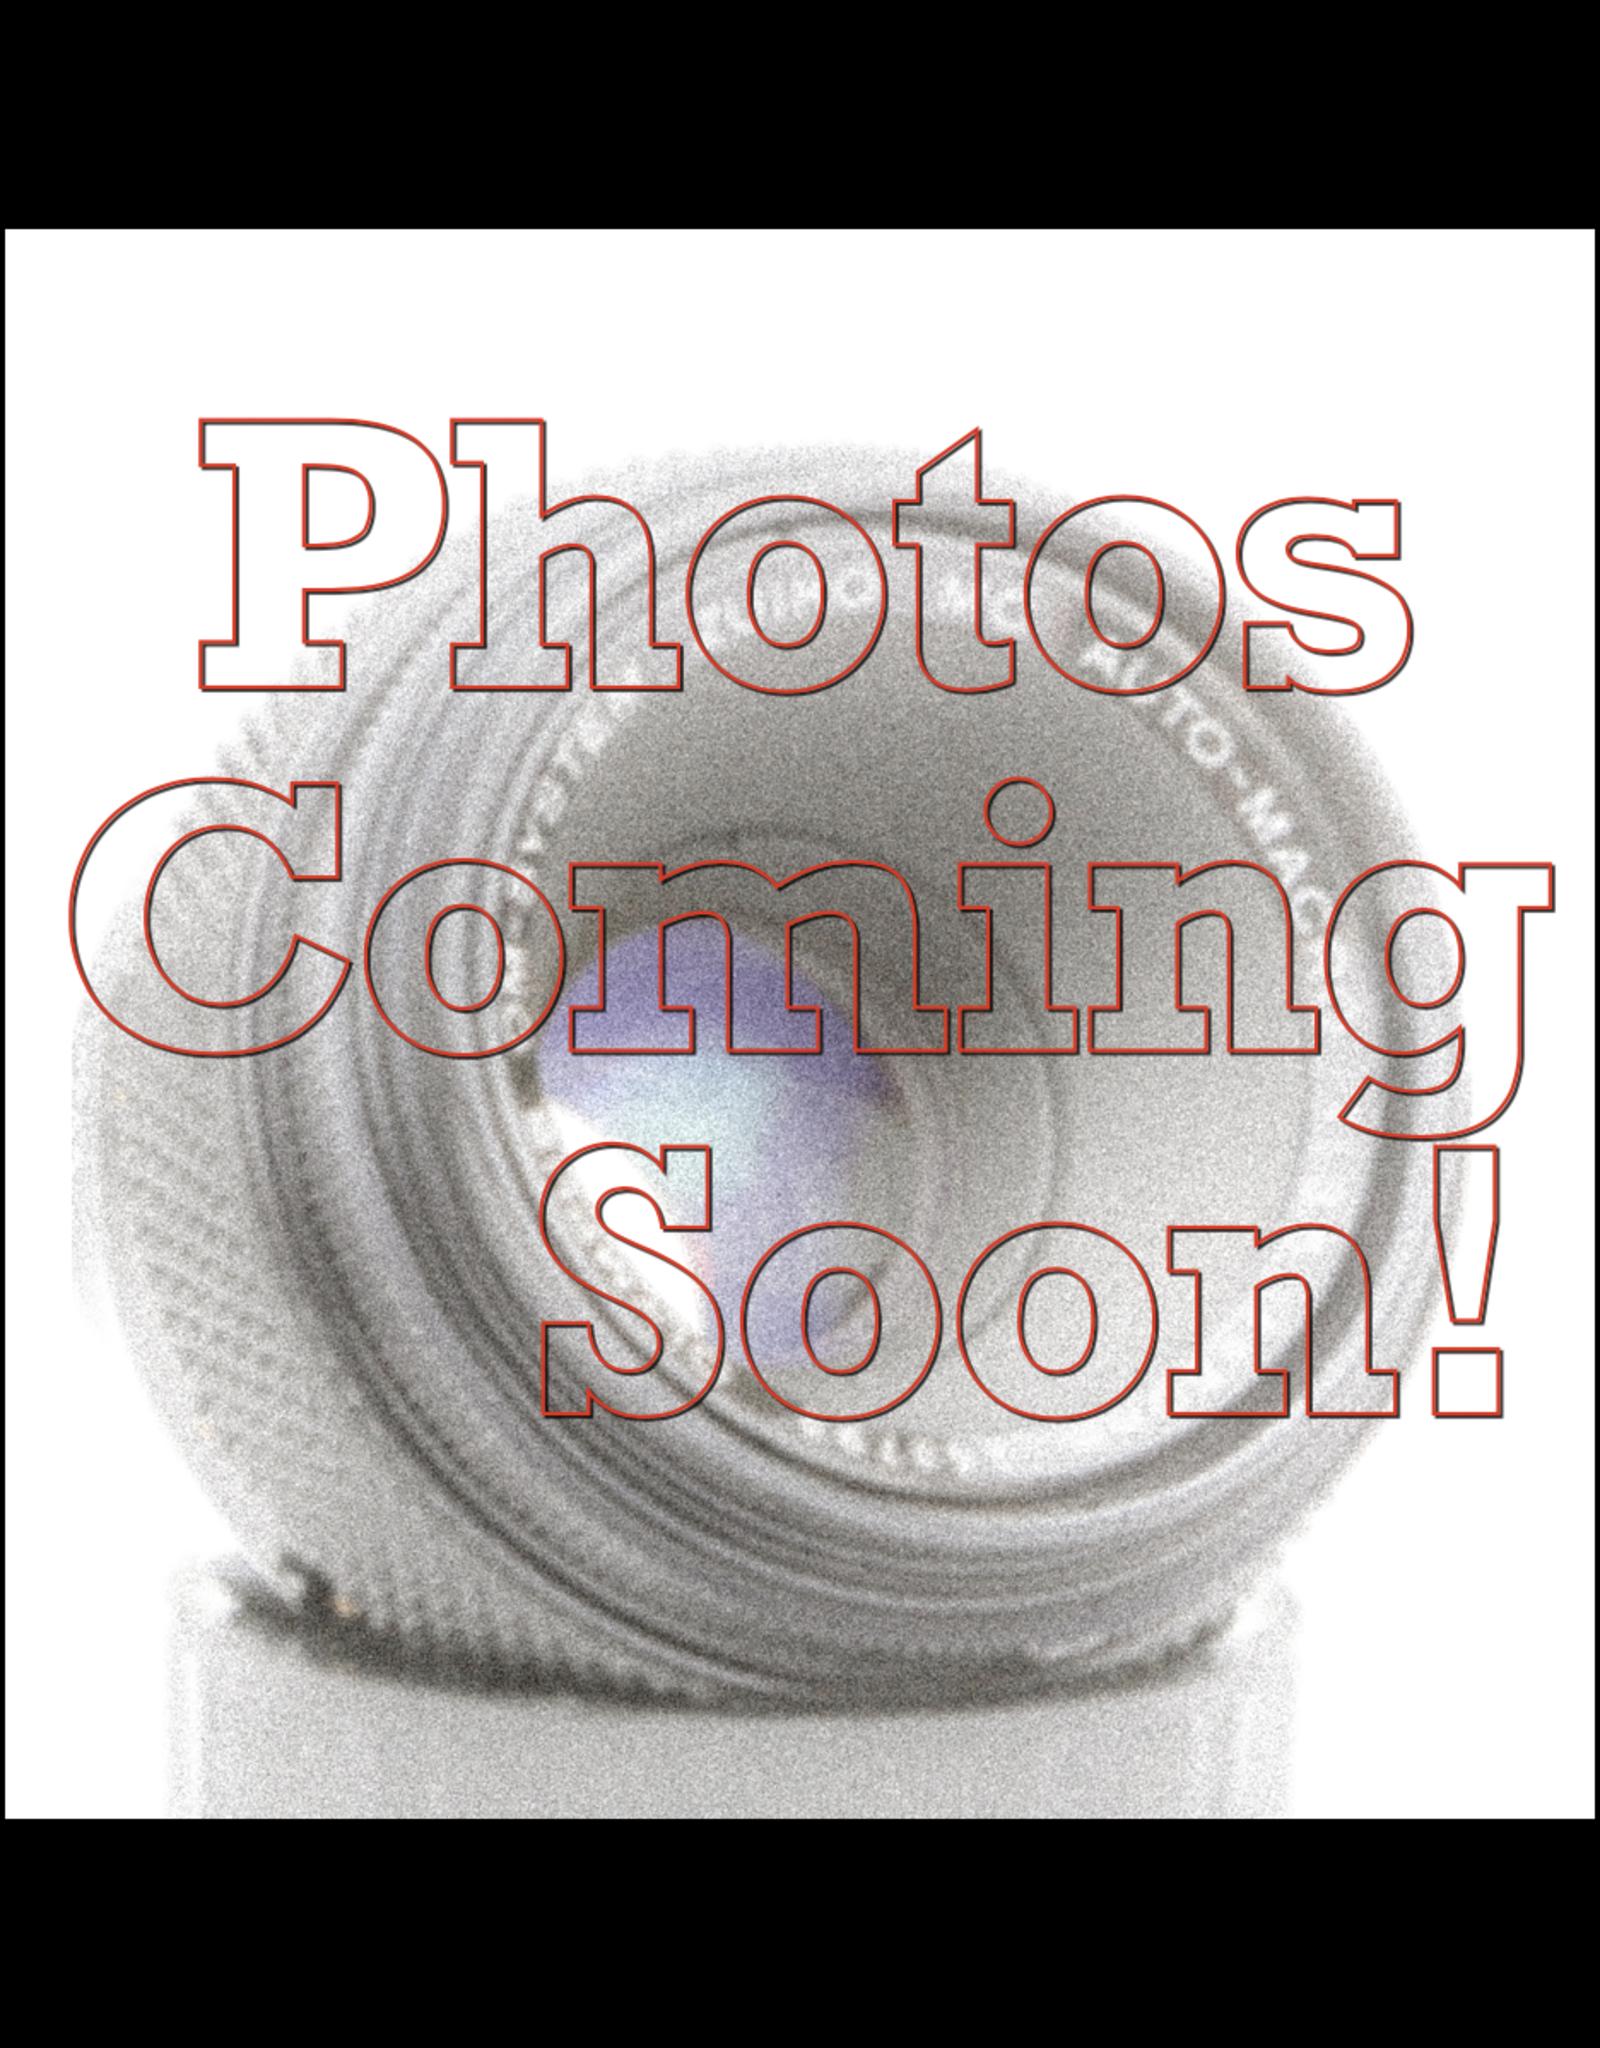 Accura Accura 28mm f2.8 Formula V Lens Minolta MD Mount